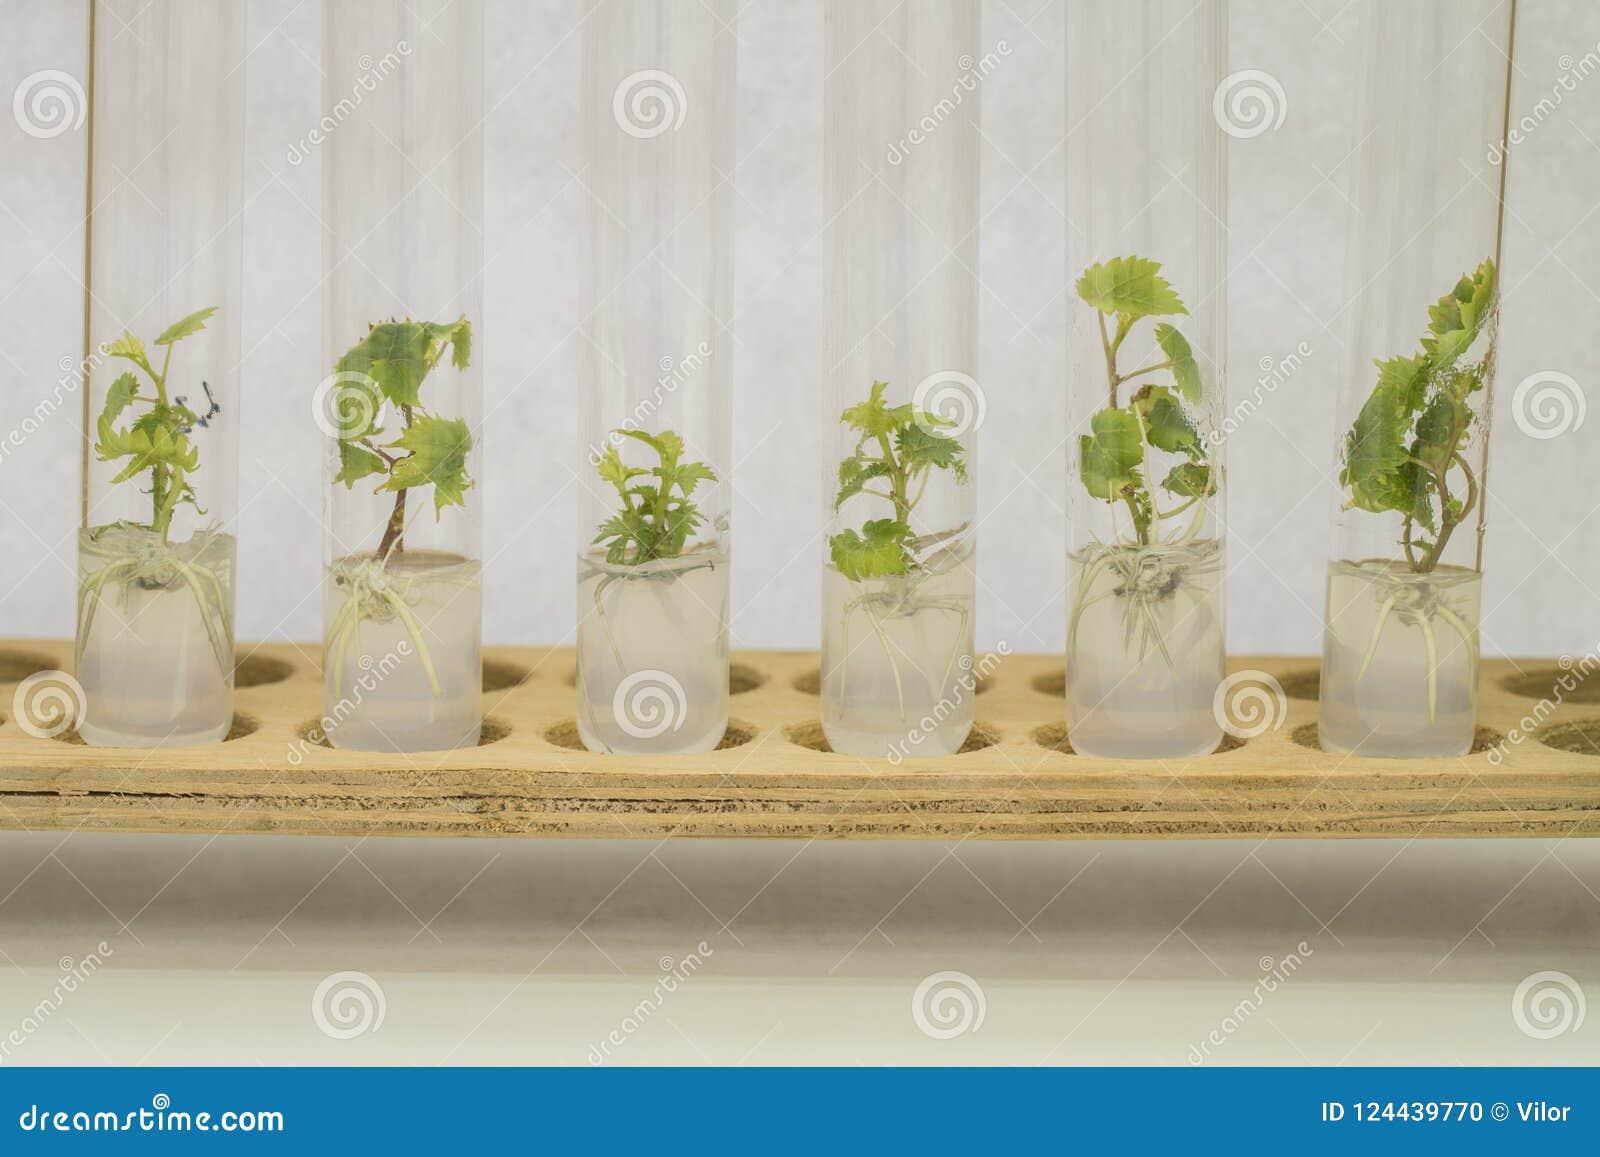 Micropropagation av druvaväxter